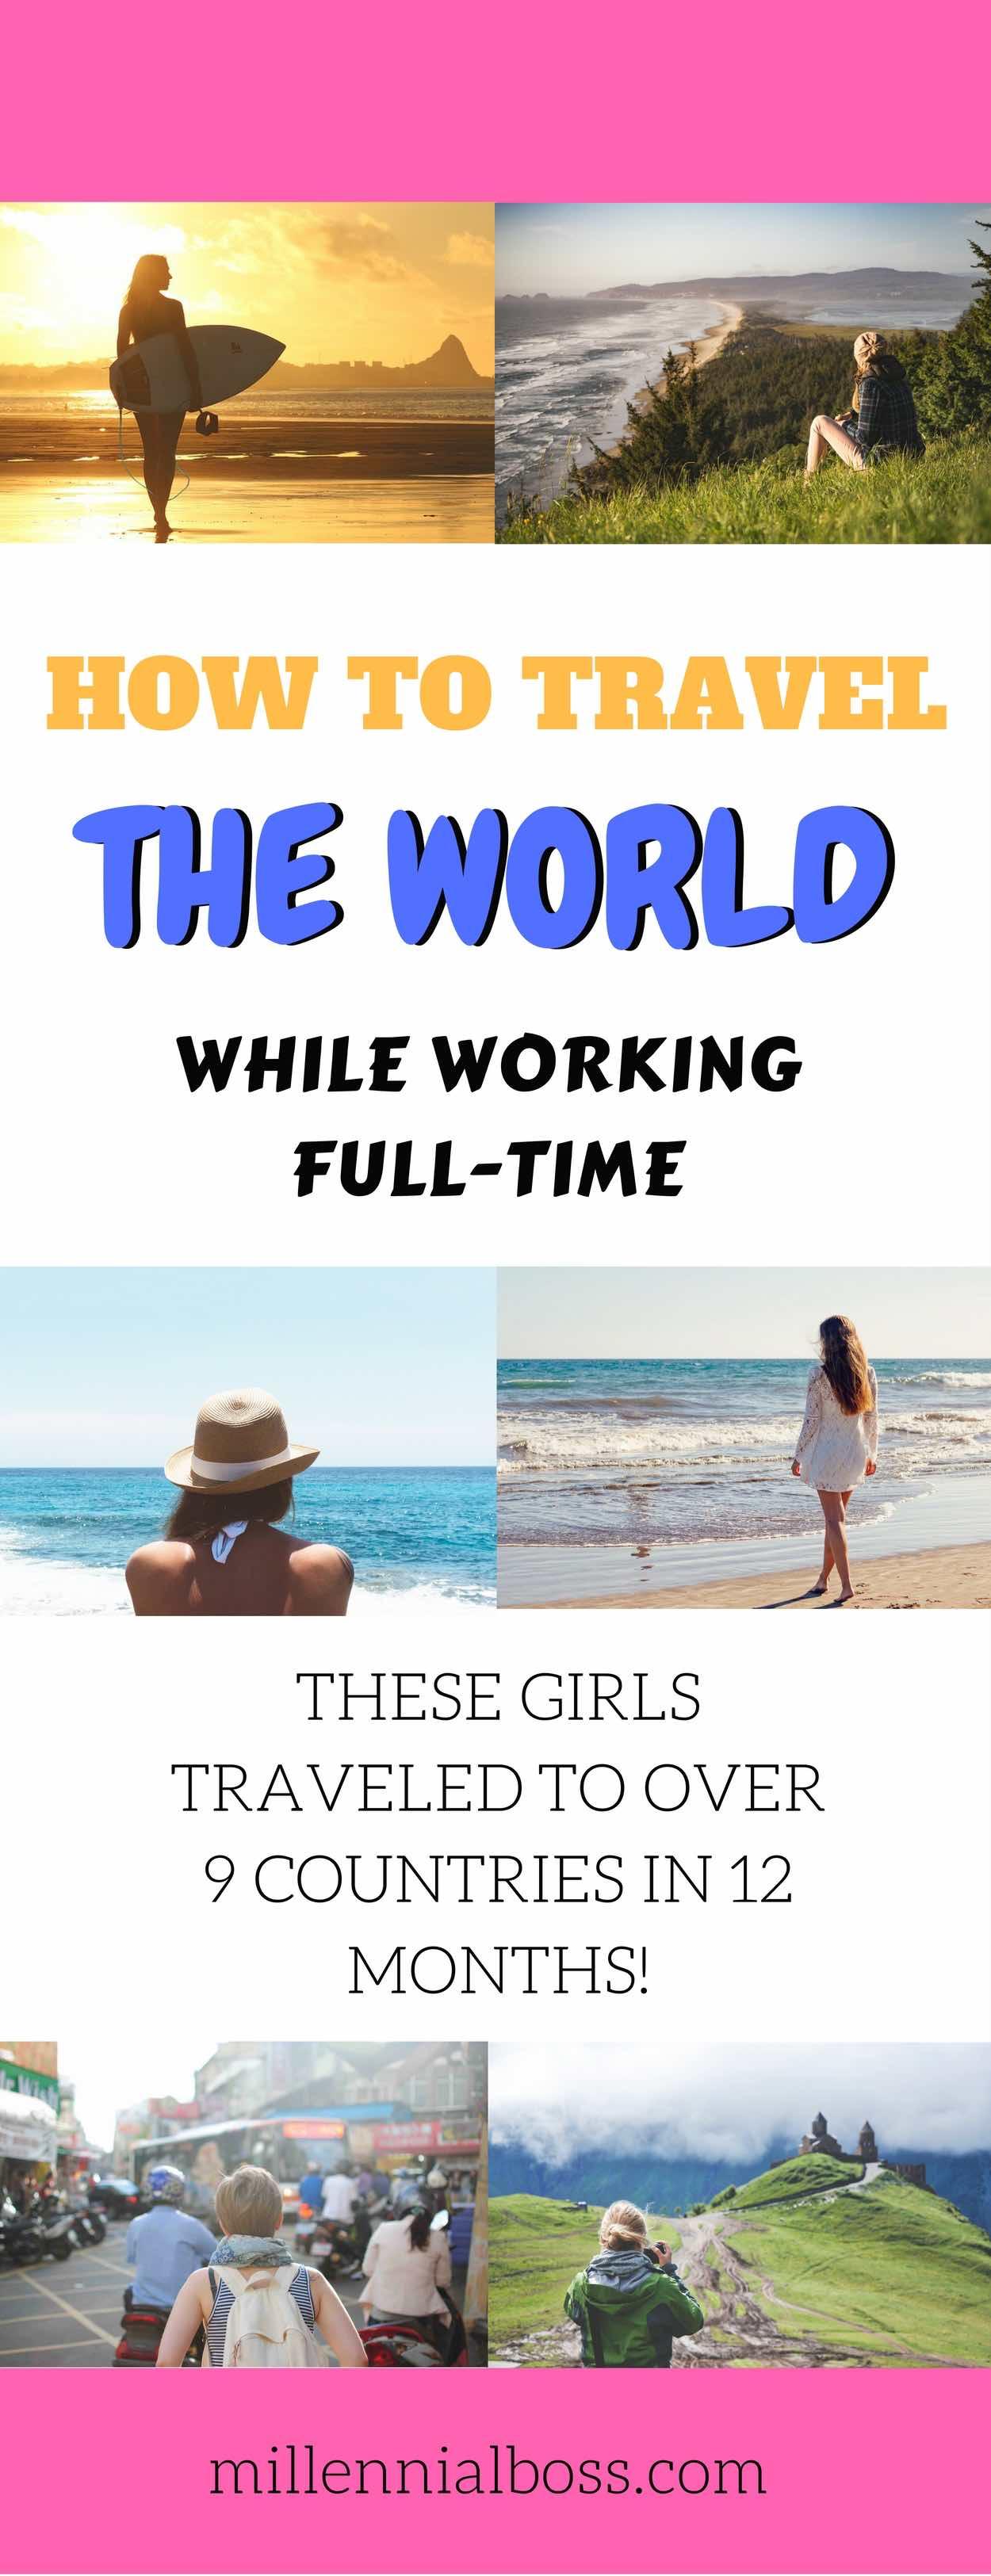 travel world while working | maximize travel while working | travel on weekends while working